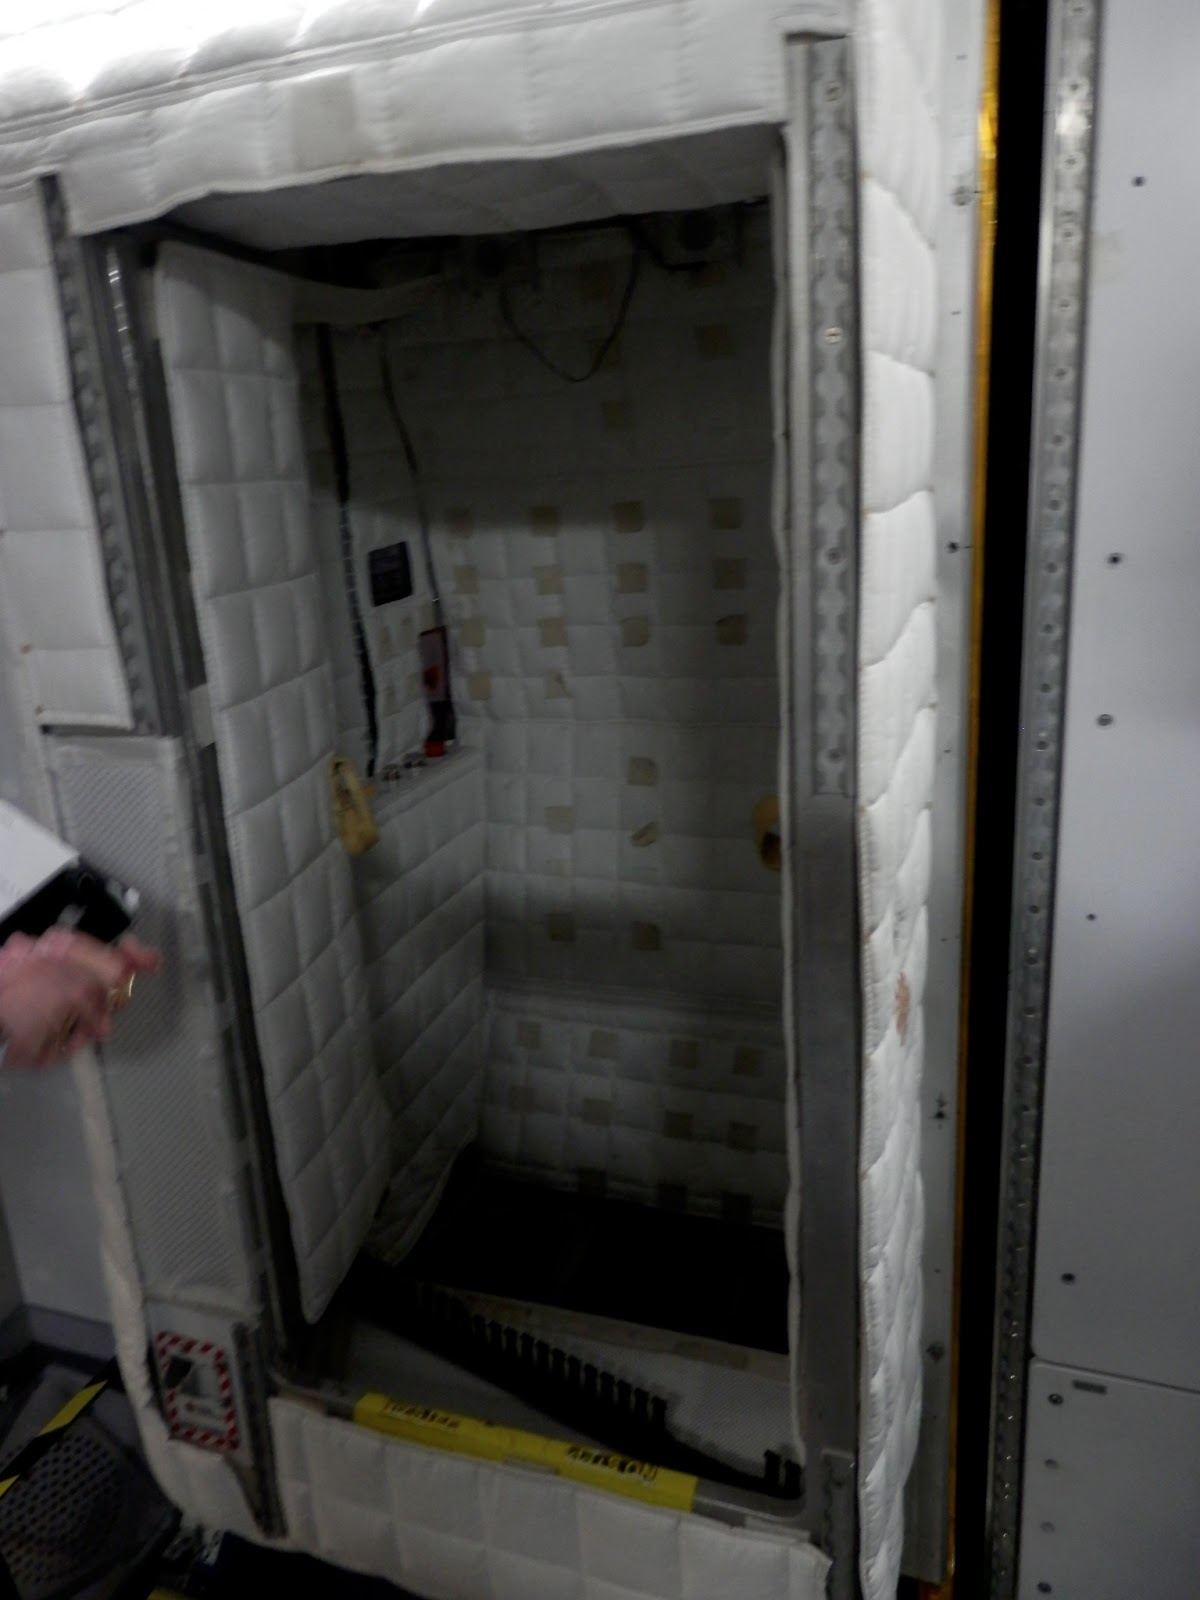 astronauts sleeping compartment - photo #25